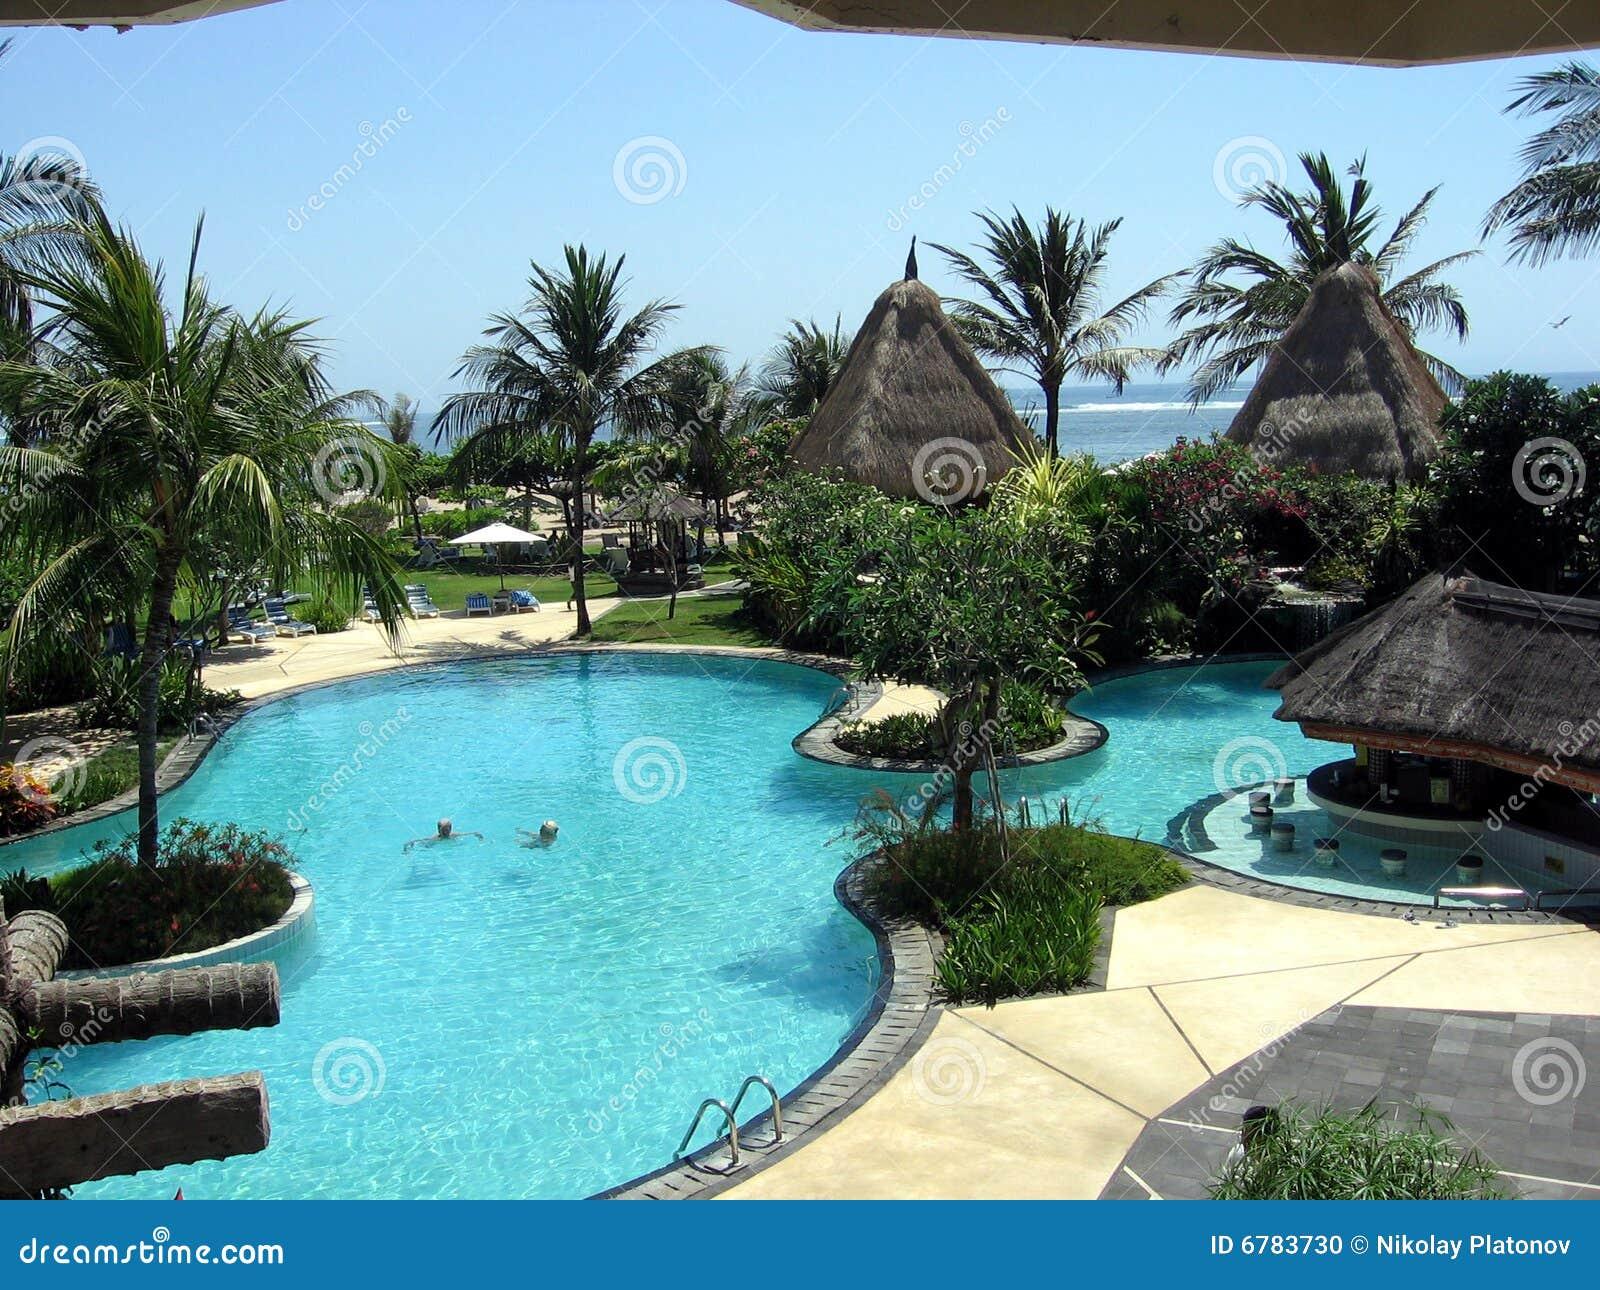 bali paradise: